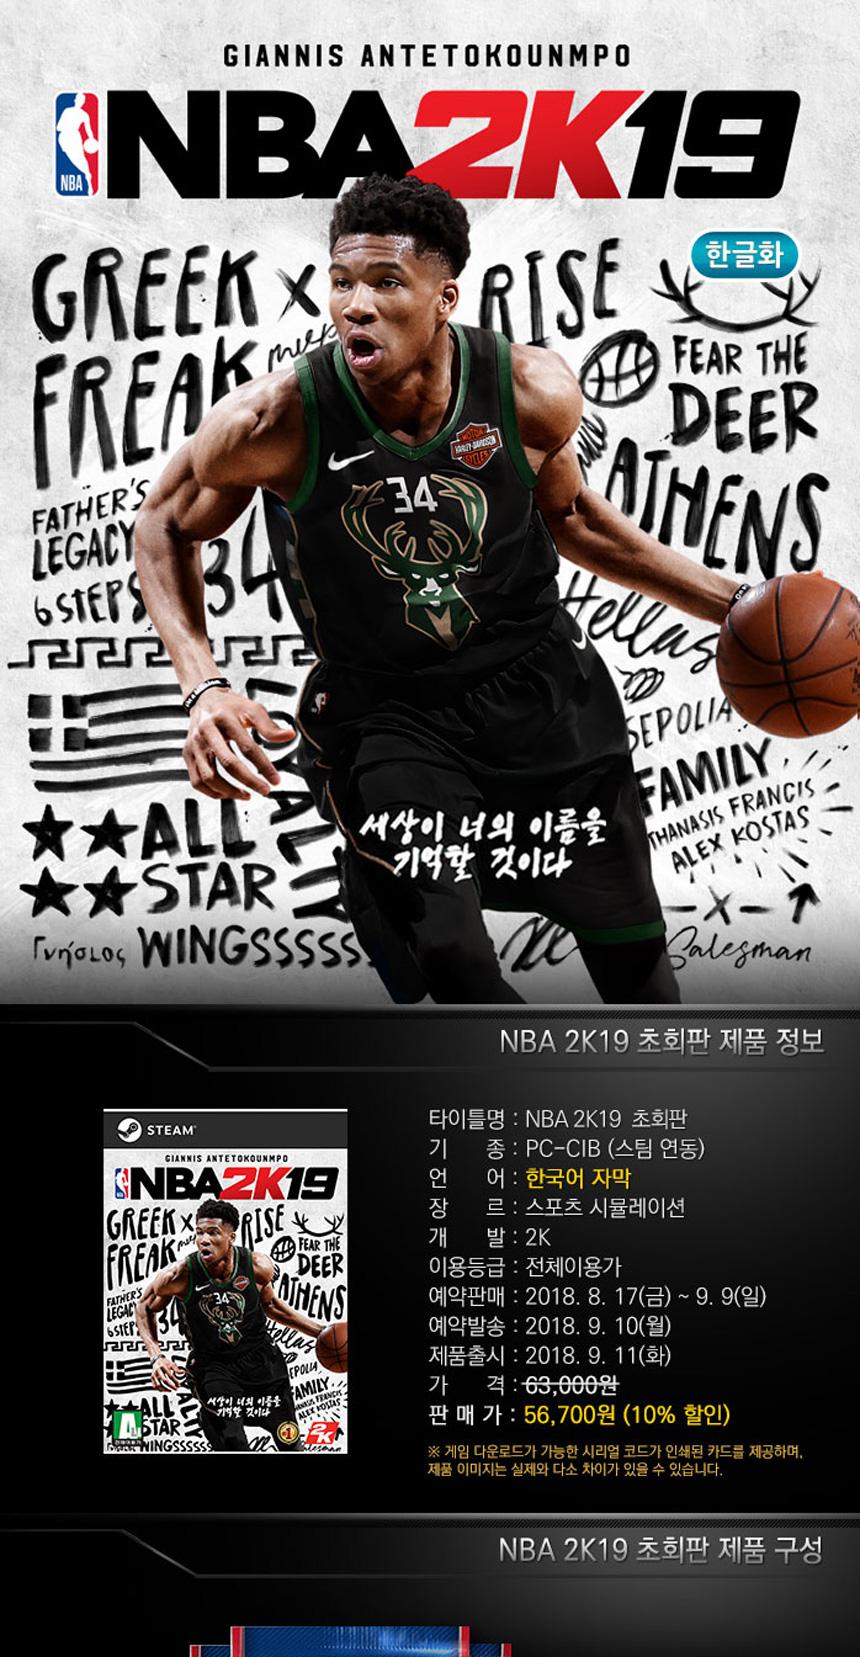 4450602c1f6a PC NBA2K19   NBA 2K19 한글판 스탠다드 에디션 - 11STREET